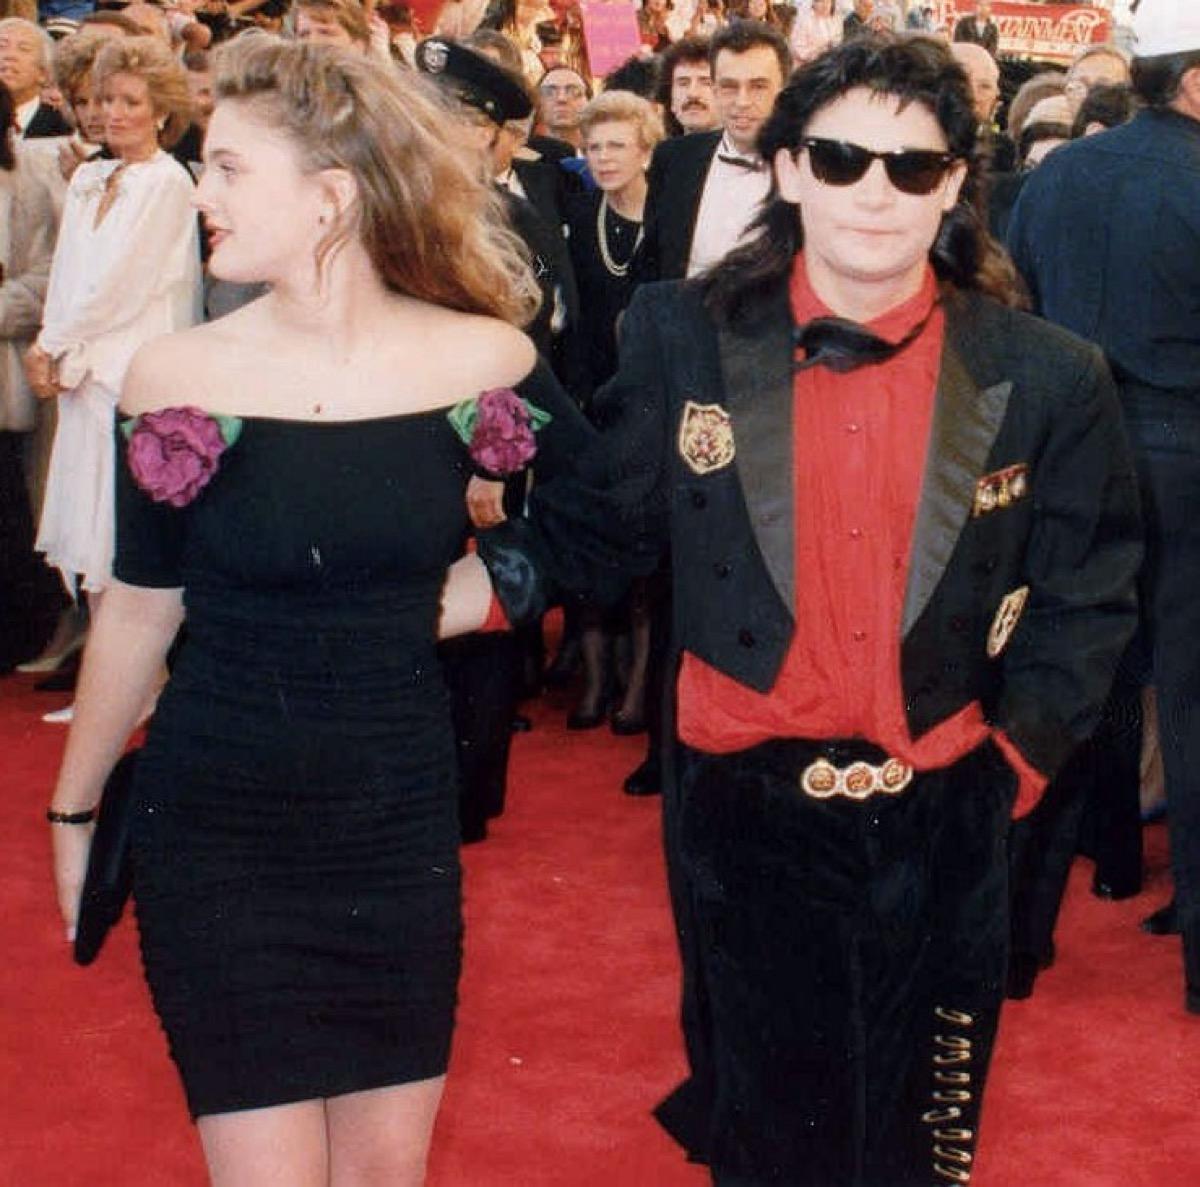 Drew Barrymore and Corey Feldman at the 61st Academy Awards, corey wearing ray ban wayfarers, 1980s fashion